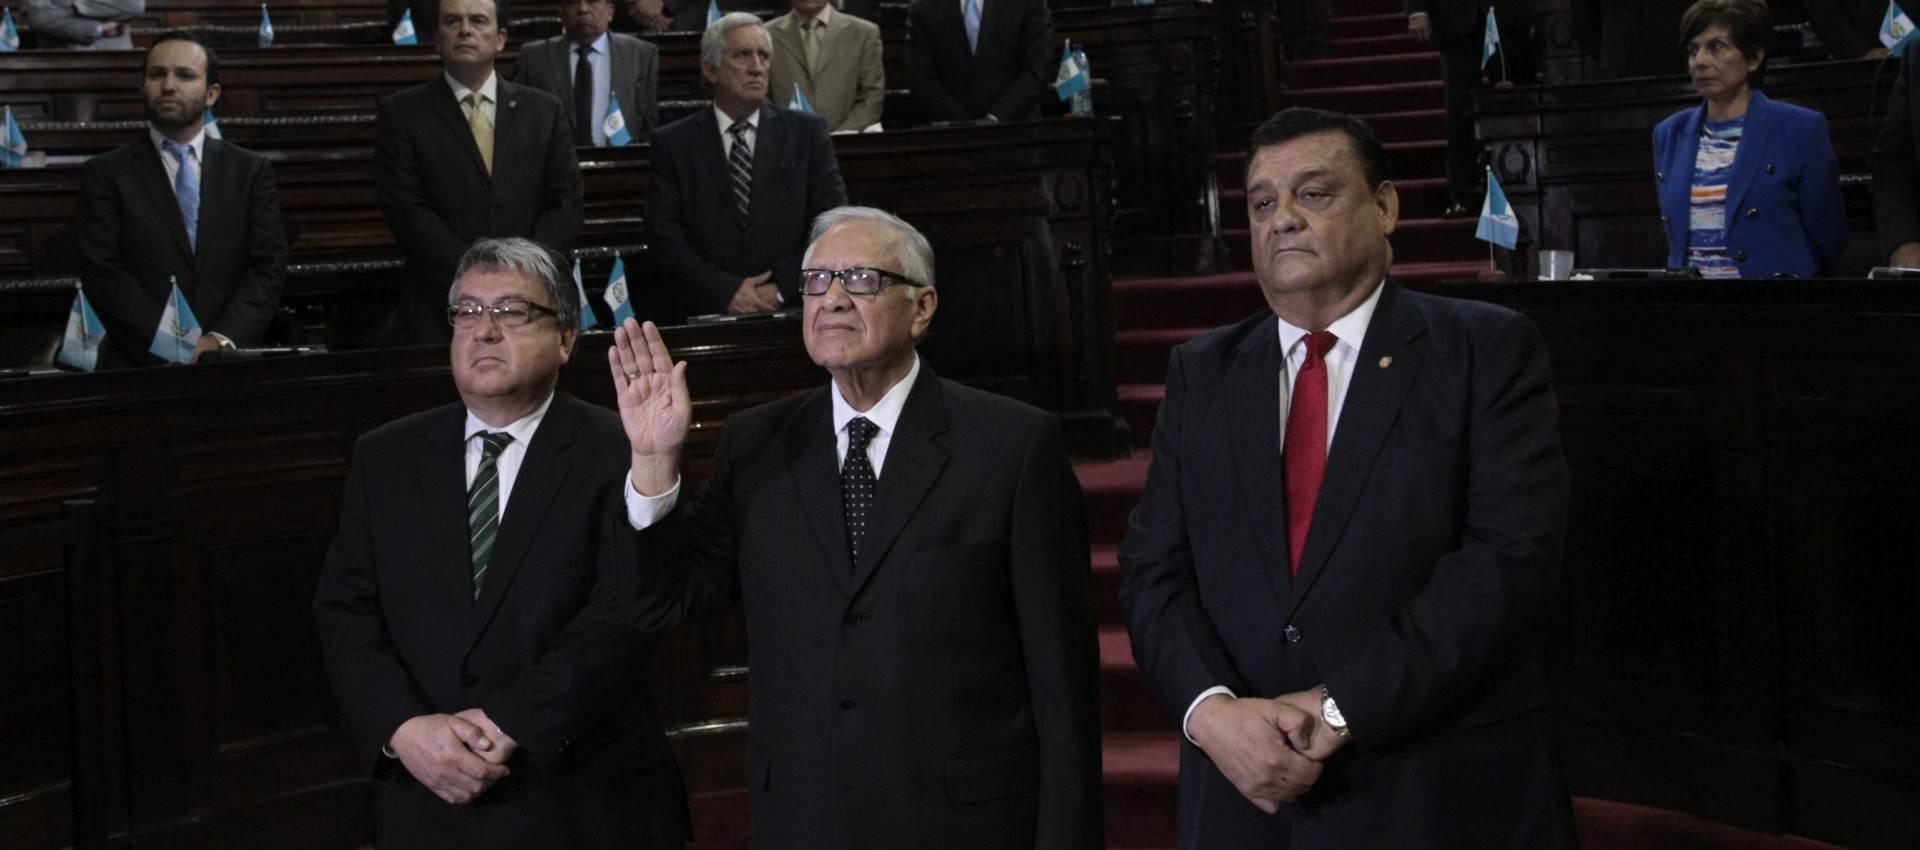 KRAJ POLITIČKE KRIZE: Maldonado novi predsjednik Gvatemale, Perez u pritvoru